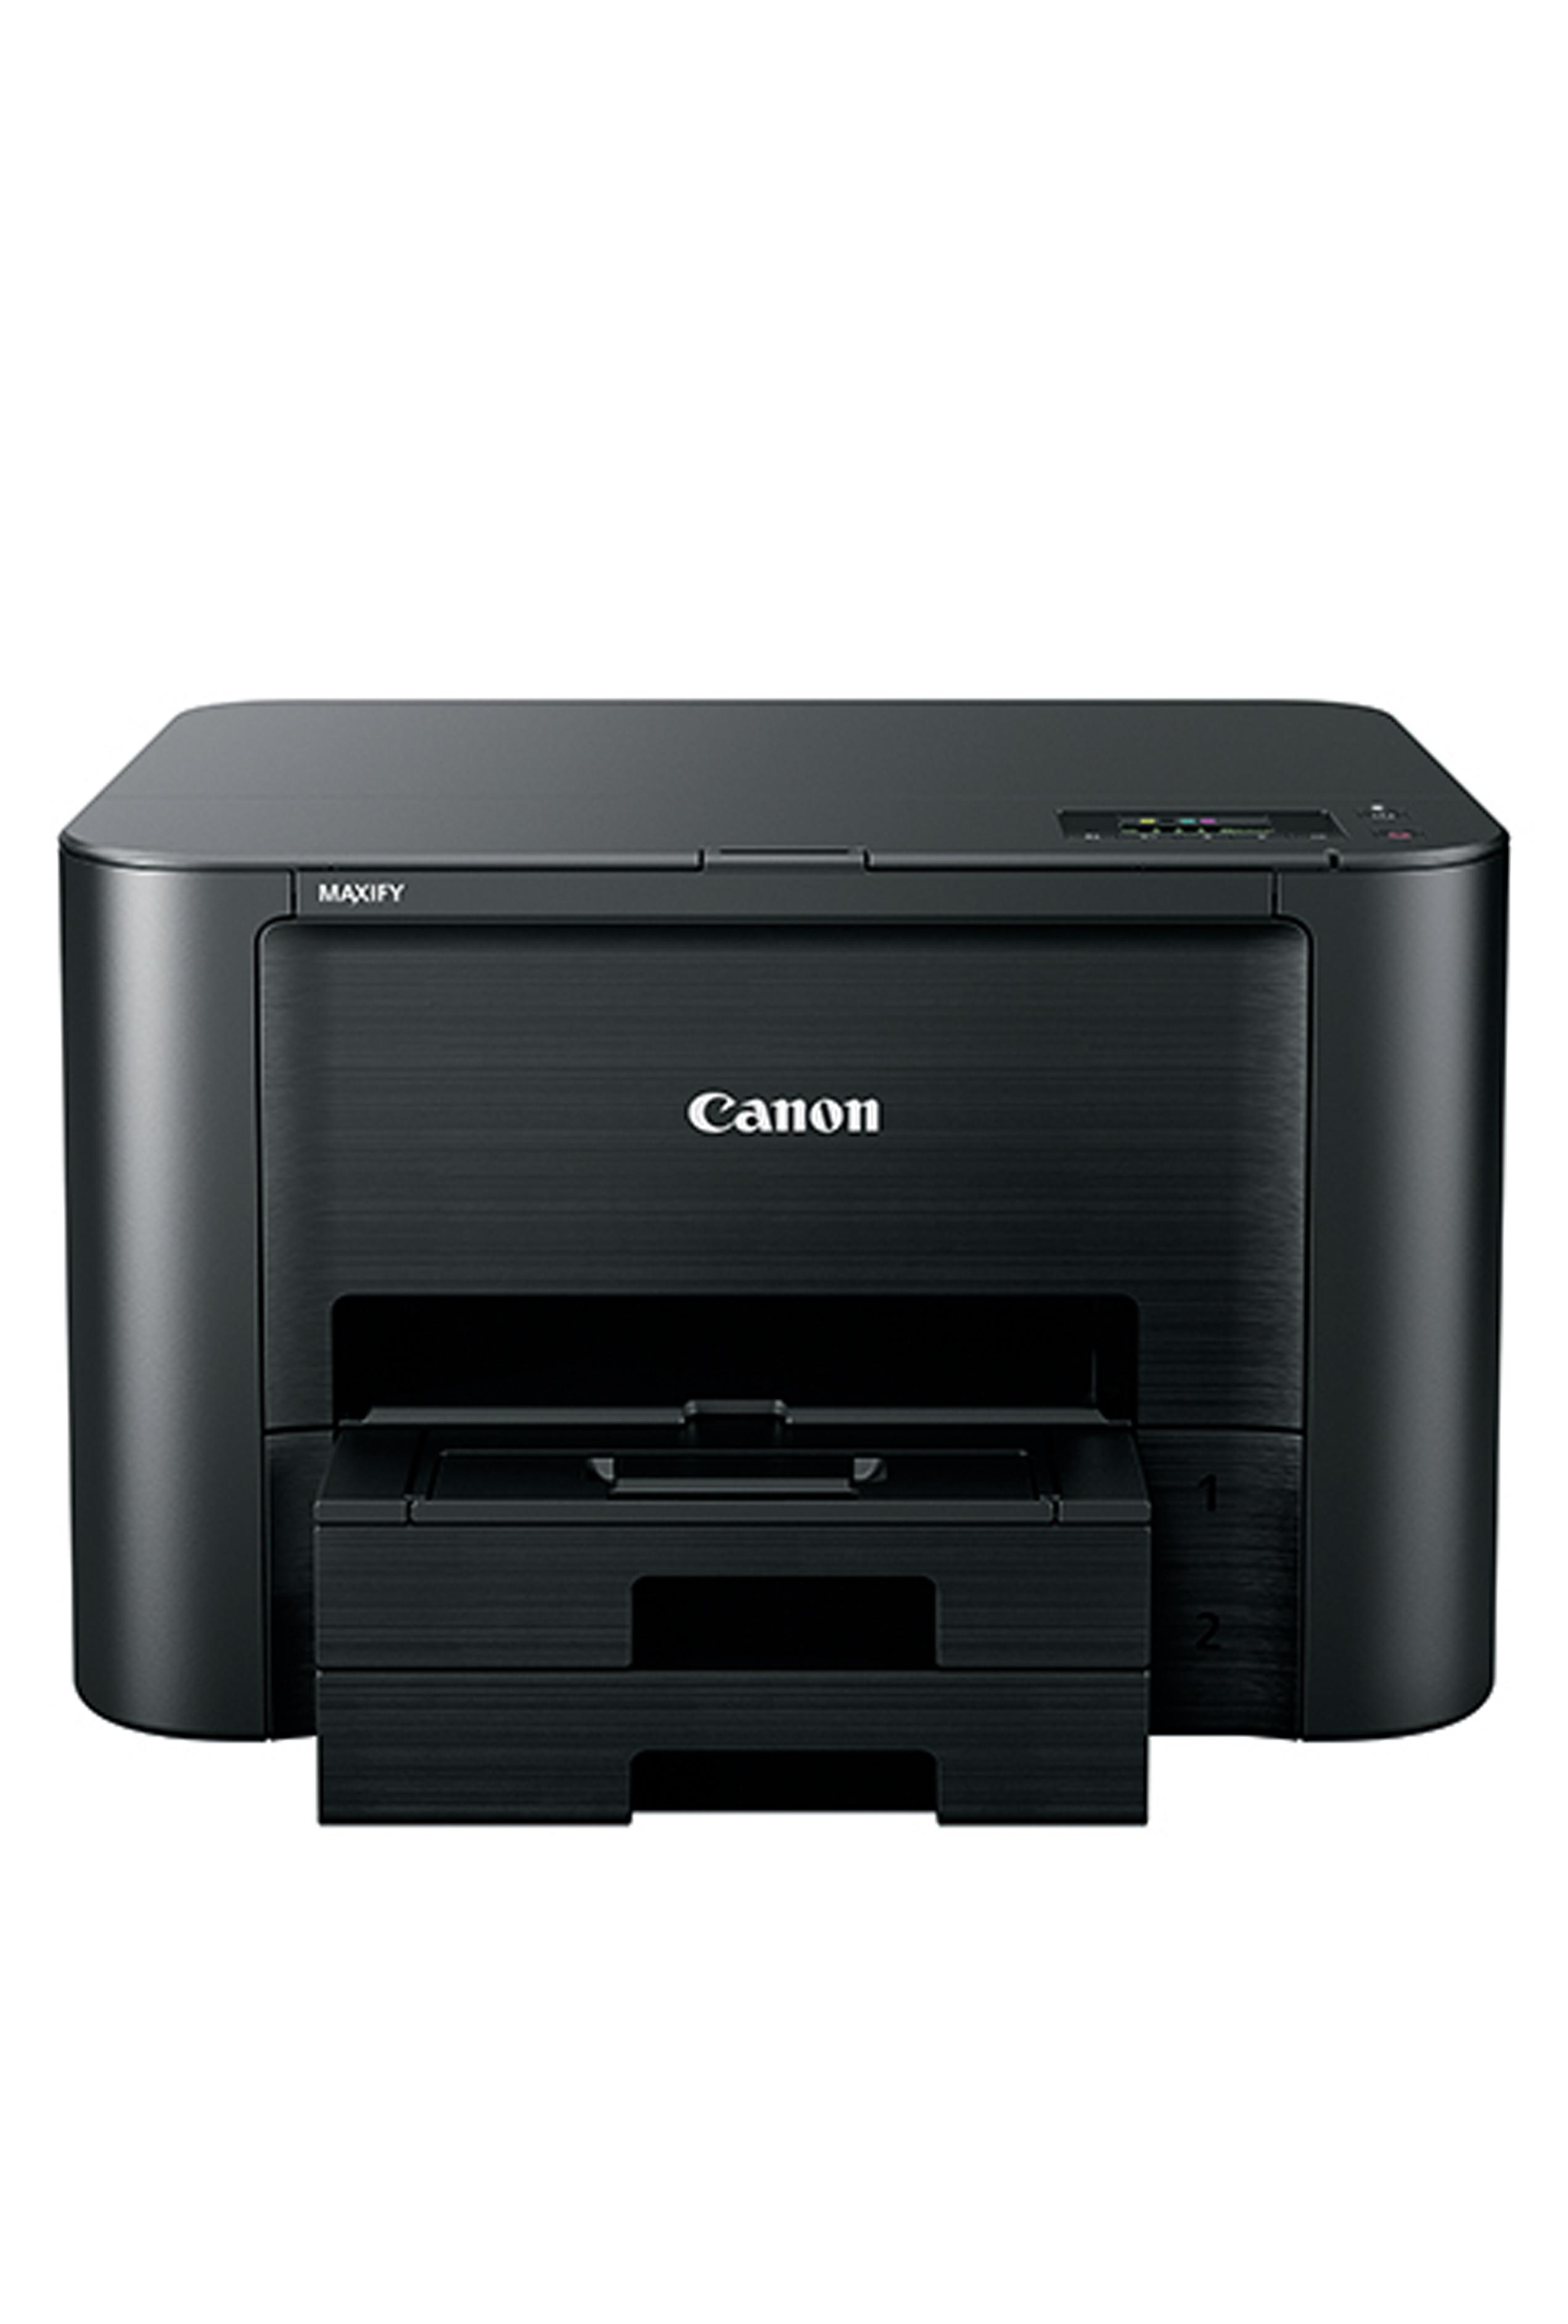 Canon MAXIFY IB4120 (15.5ppm/24ppm)